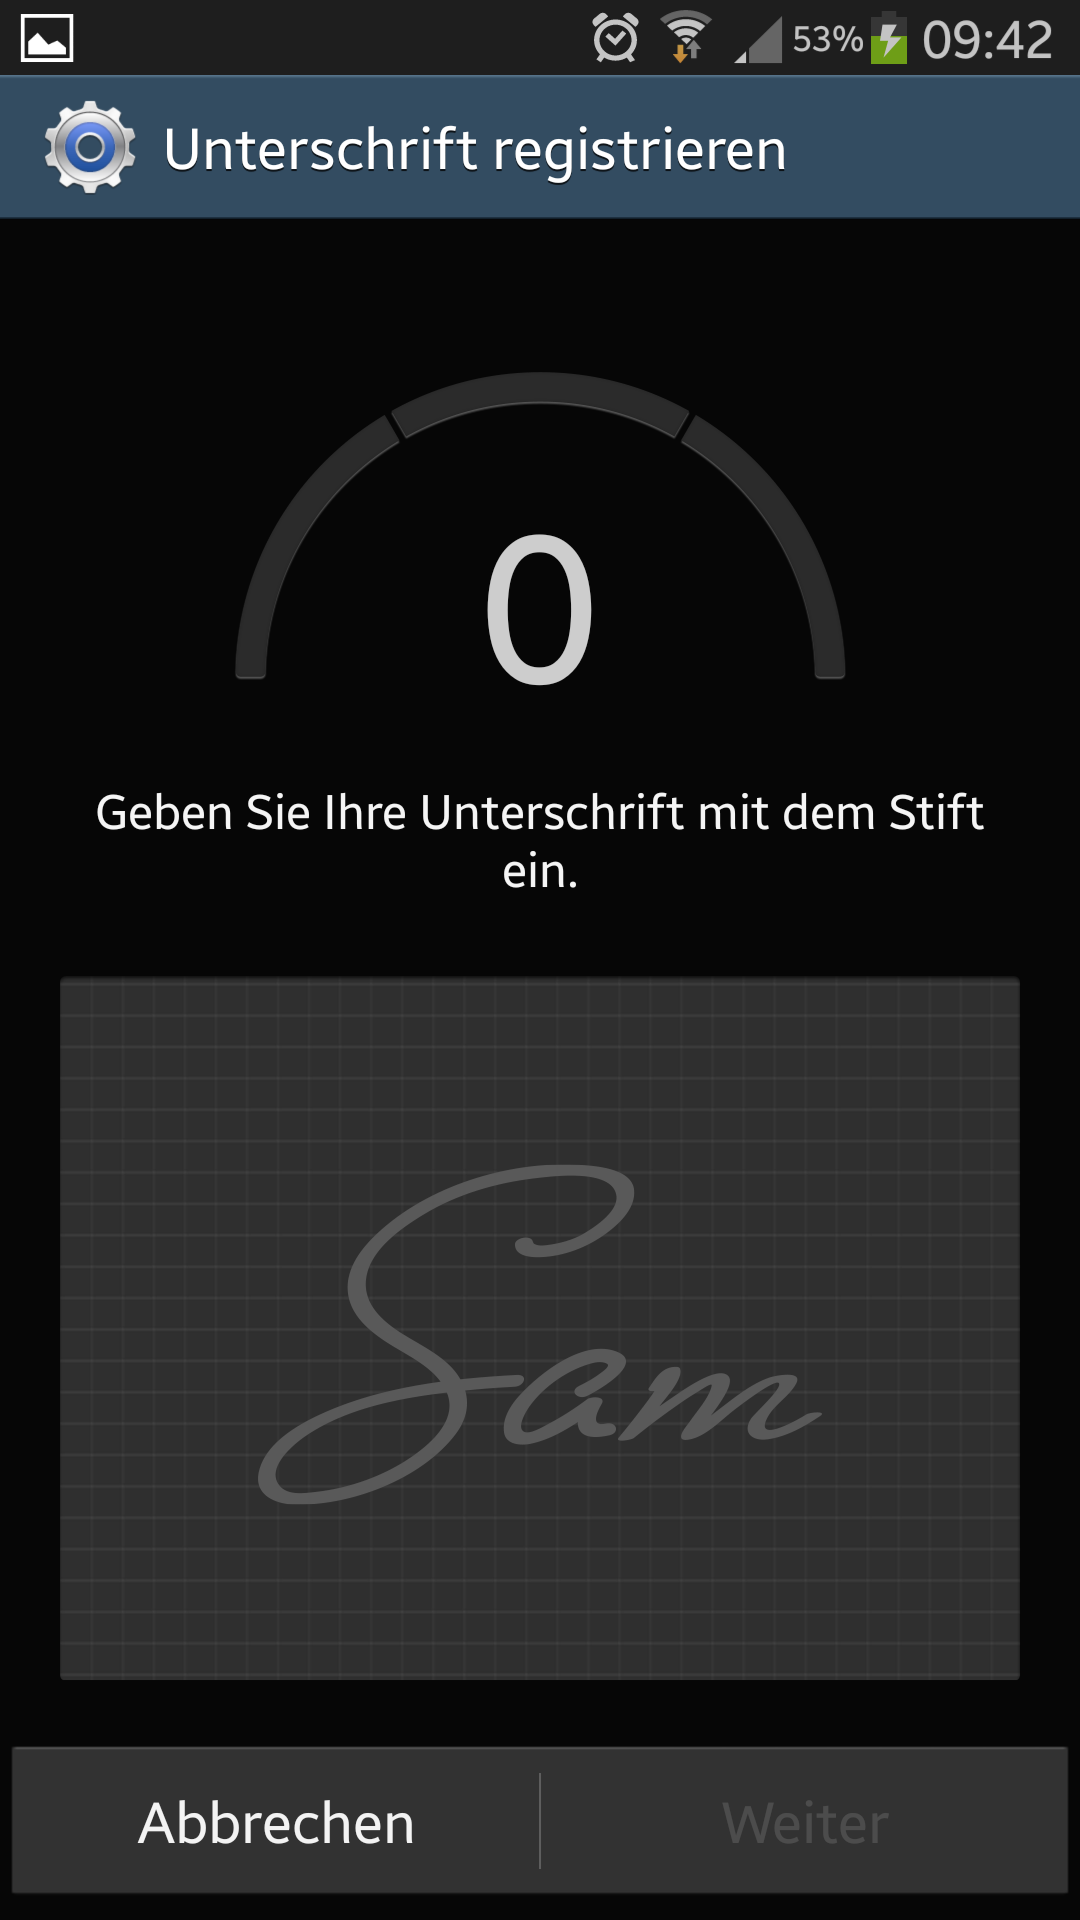 screenshot_2014 01 27 09 42 05 - Muster Passwort